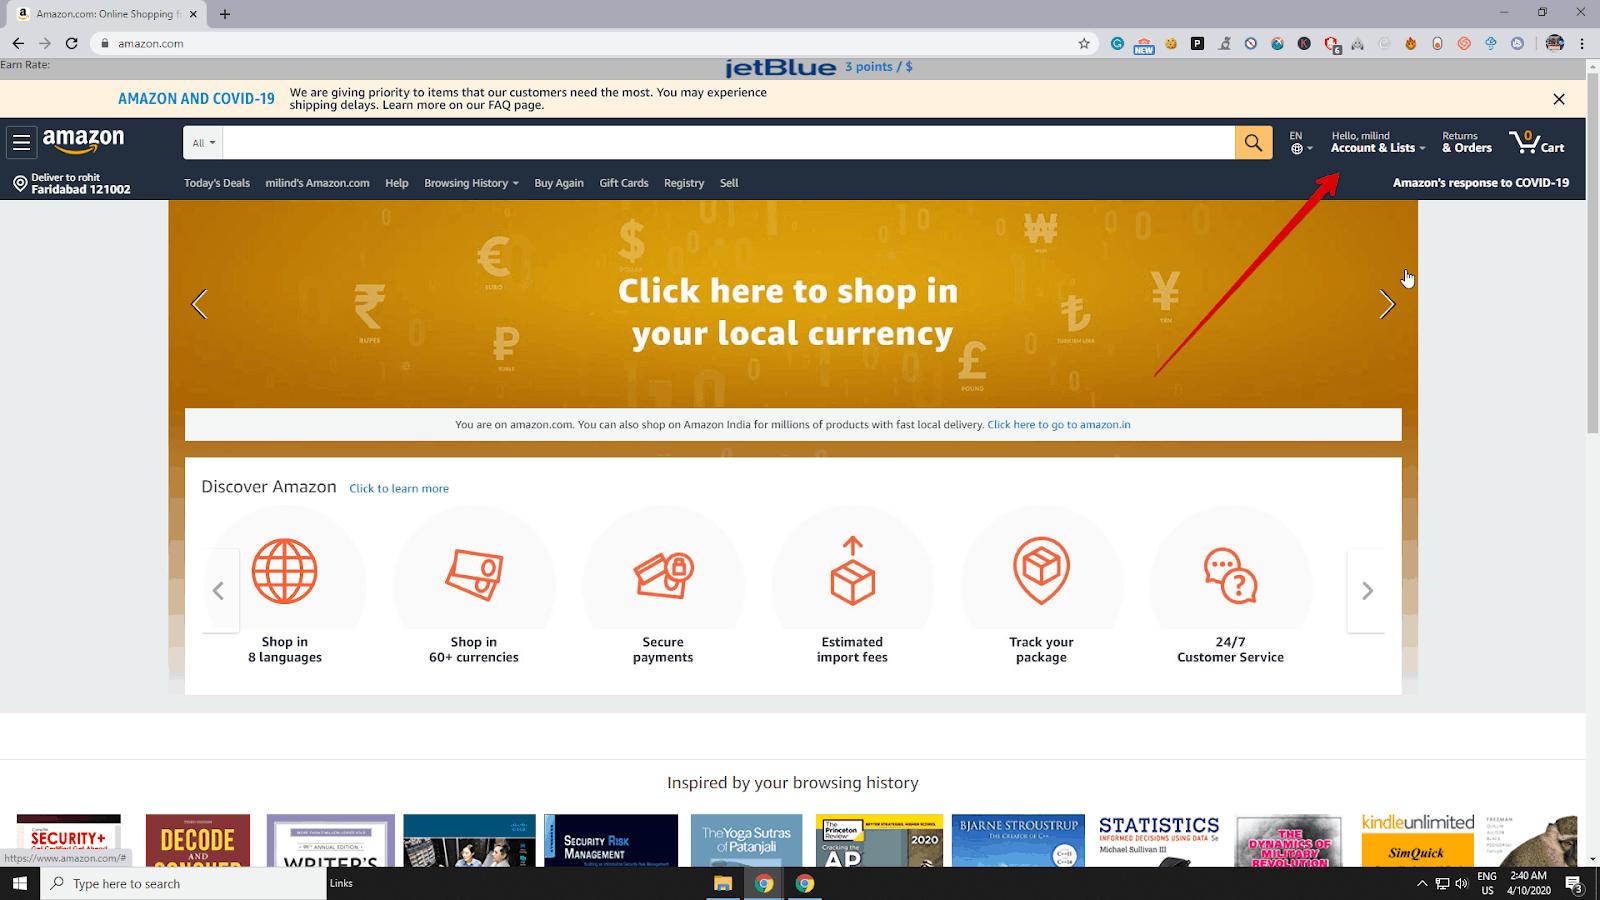 Amazon accounts and lists